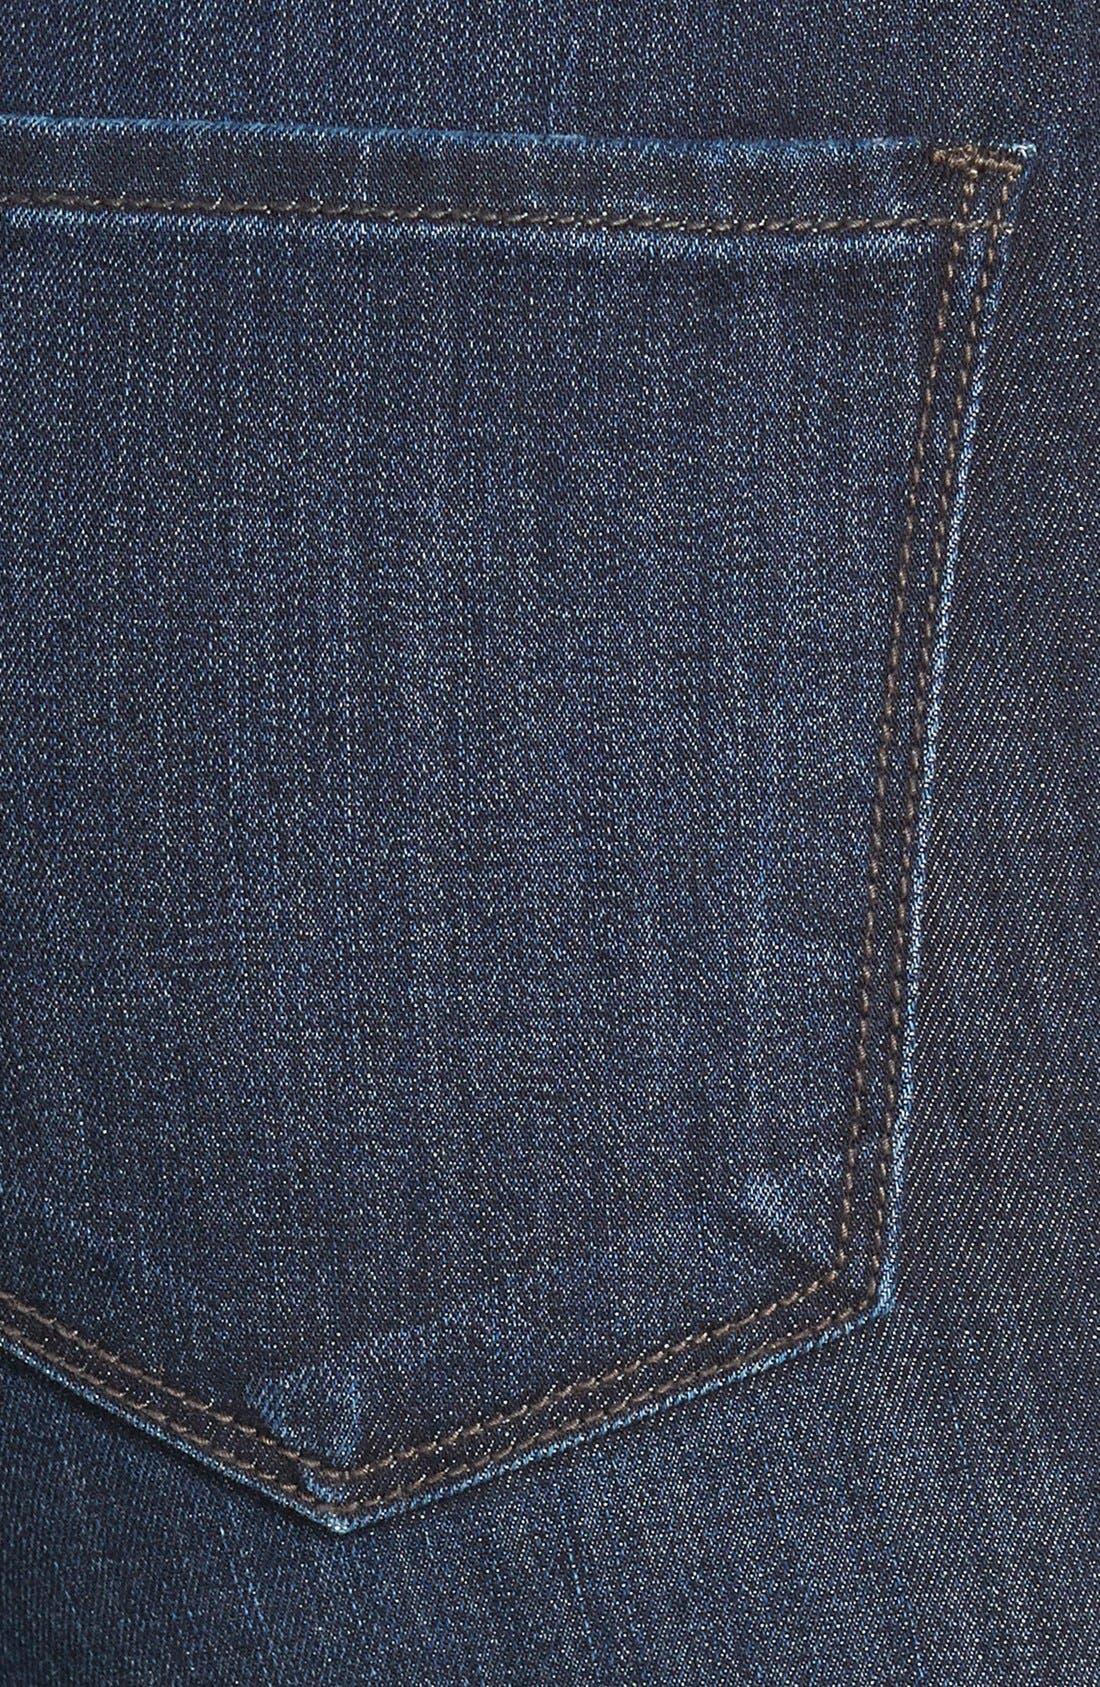 Alternate Image 3  - Lucky Brand 'Brooke' Stretch Bootcut Jeans (Serpantine)